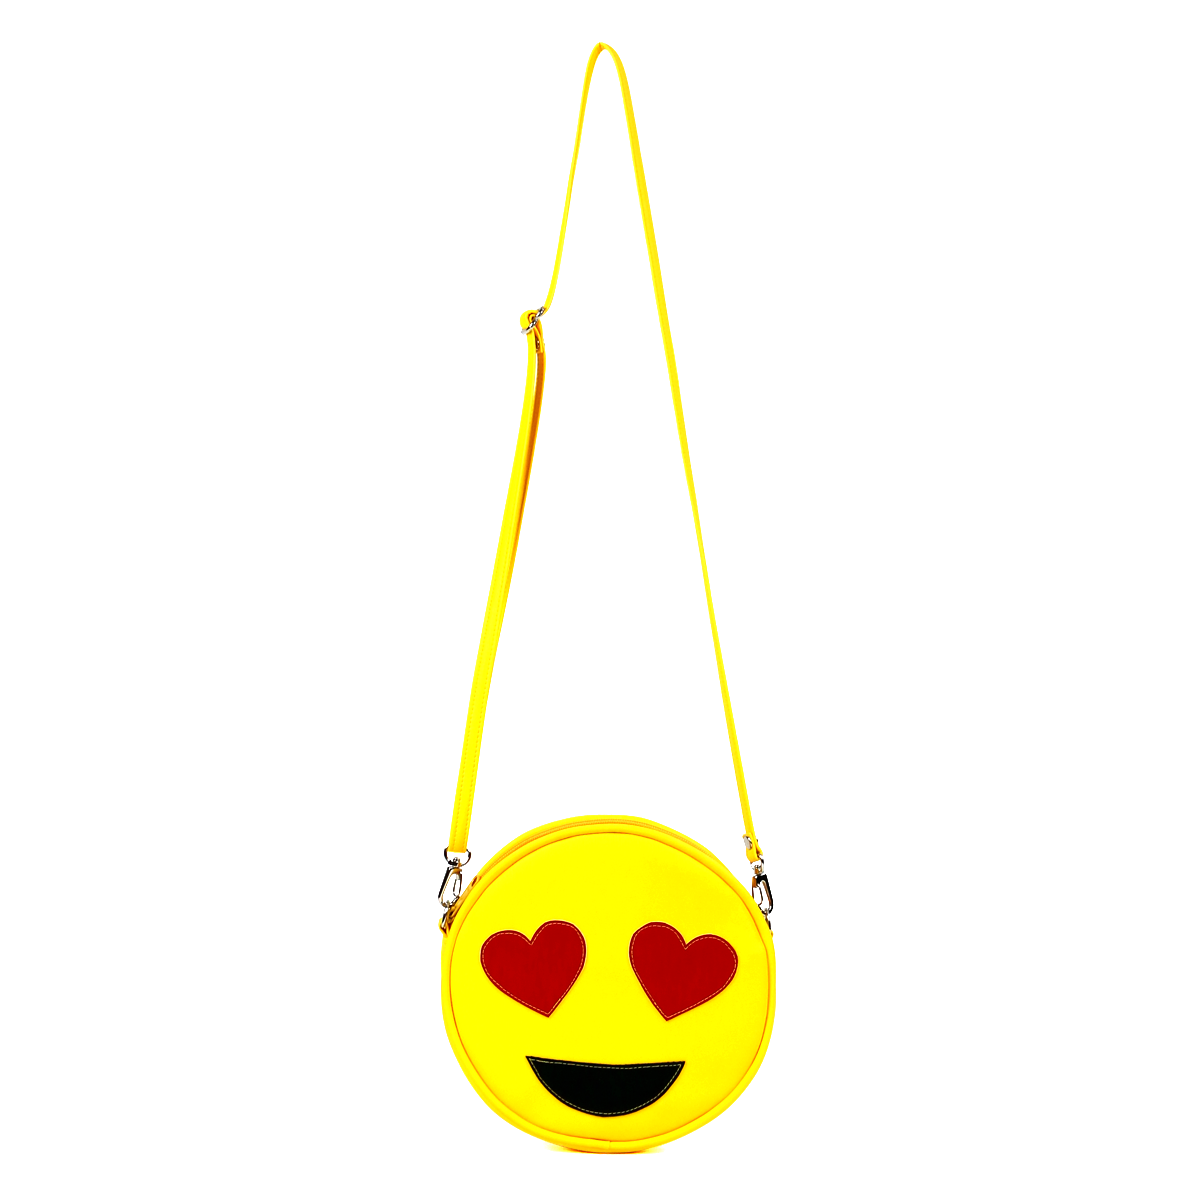 Emoji Heart-Eyes Vegan Crossbody/Clutch Bag – Crossbody and wristlet